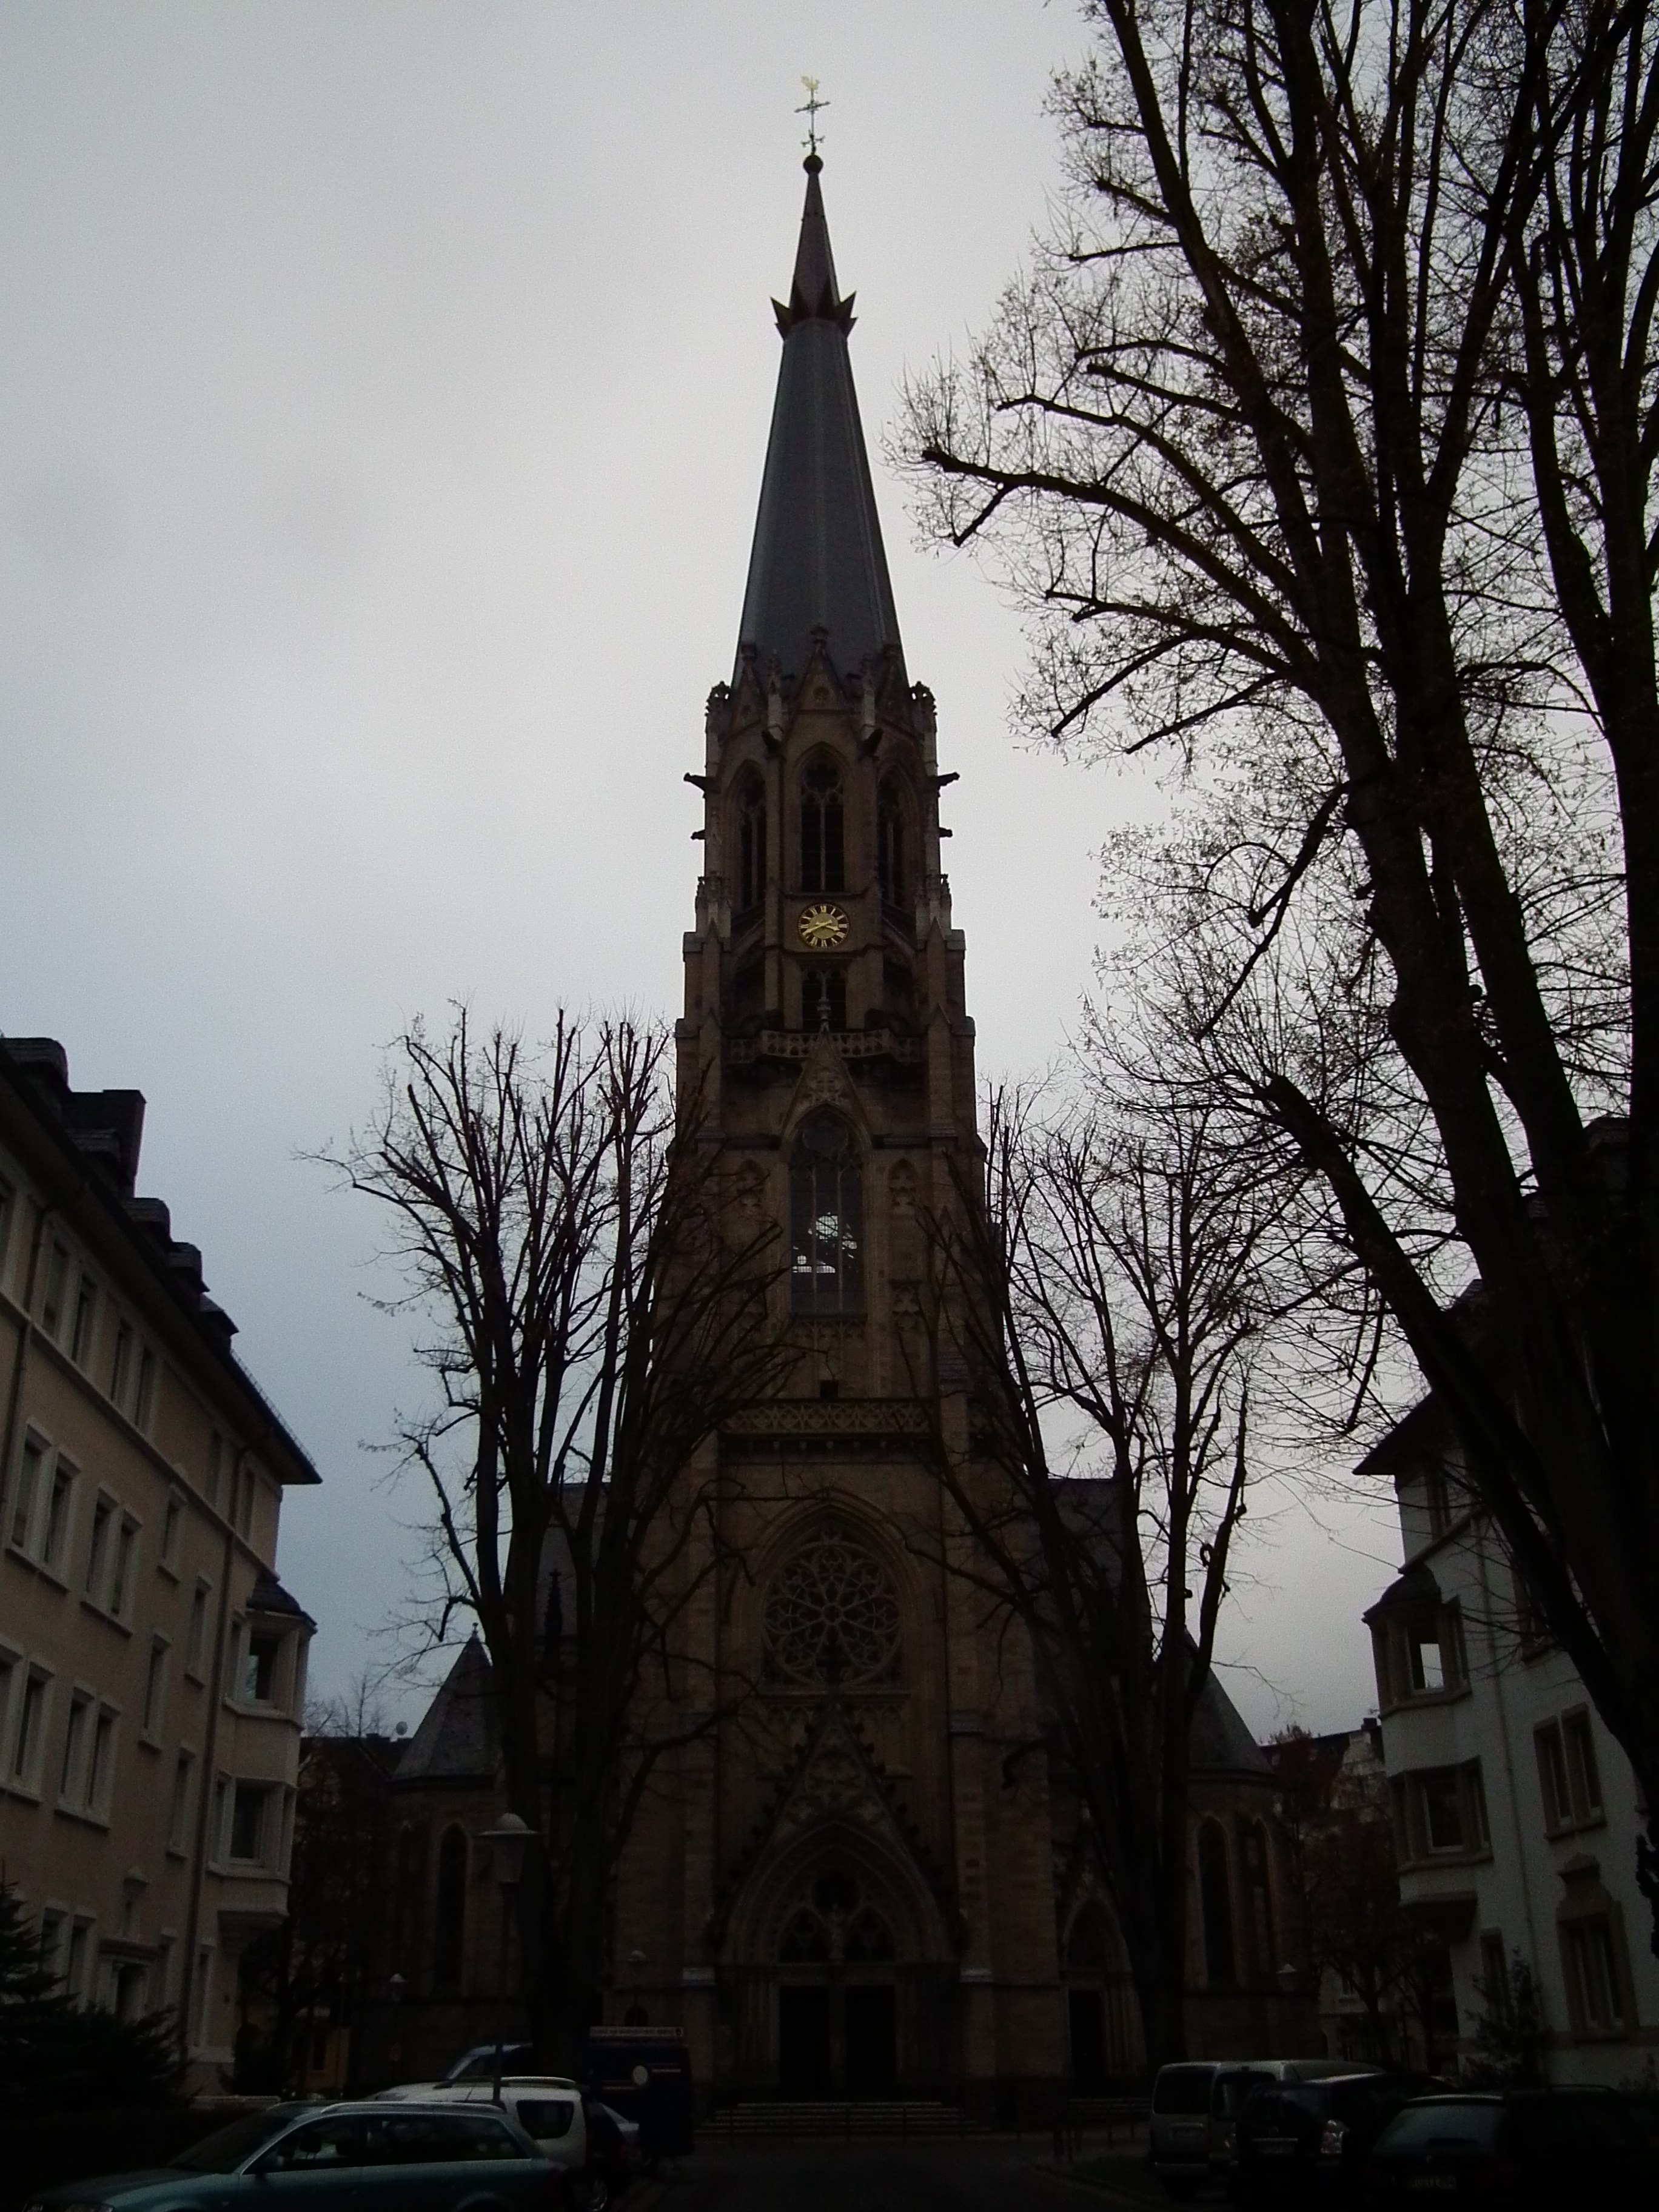 katholische kirche koblenz